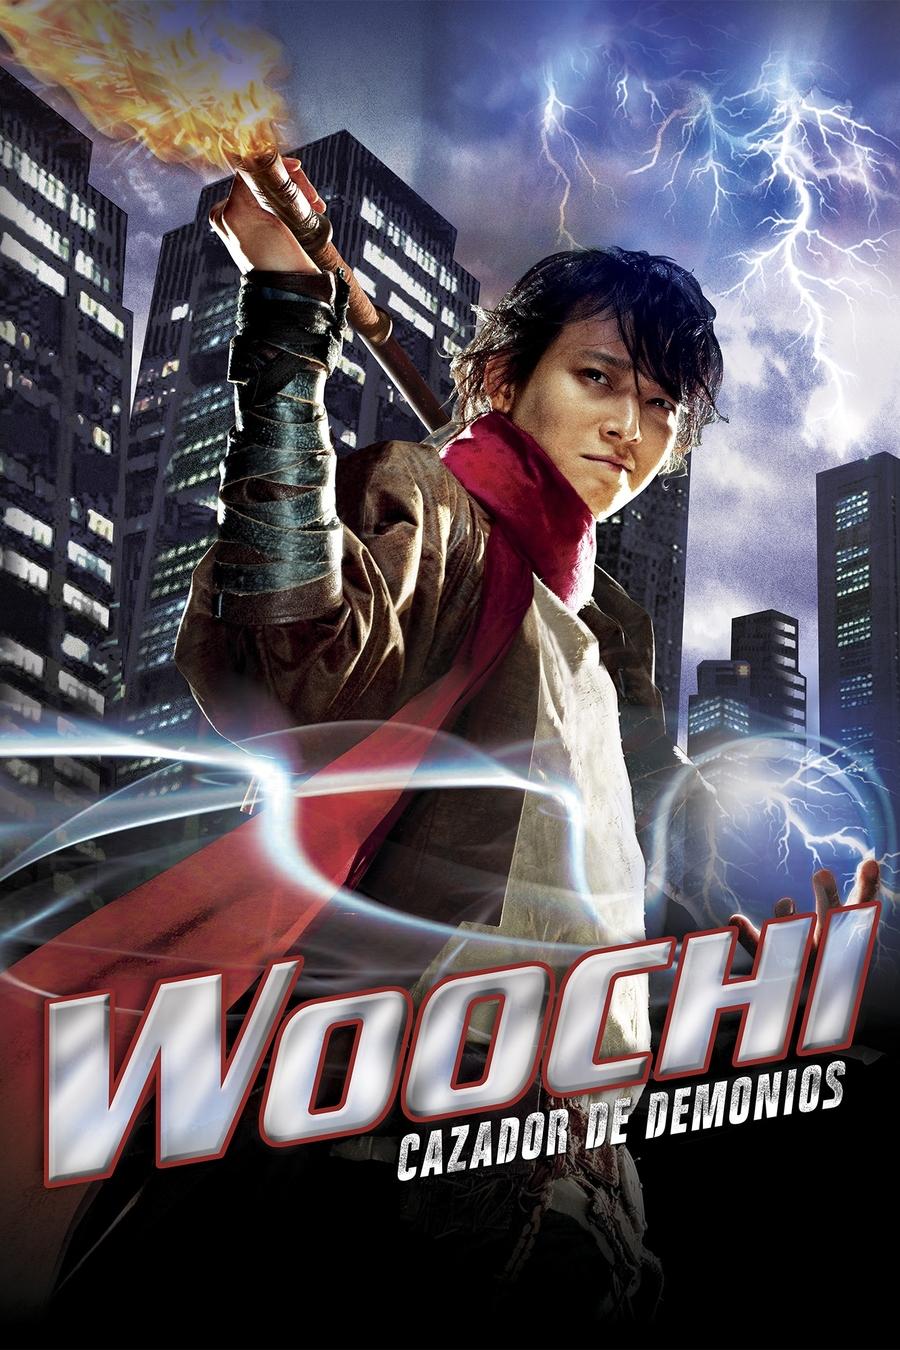 Woochi, caçador de dimonis